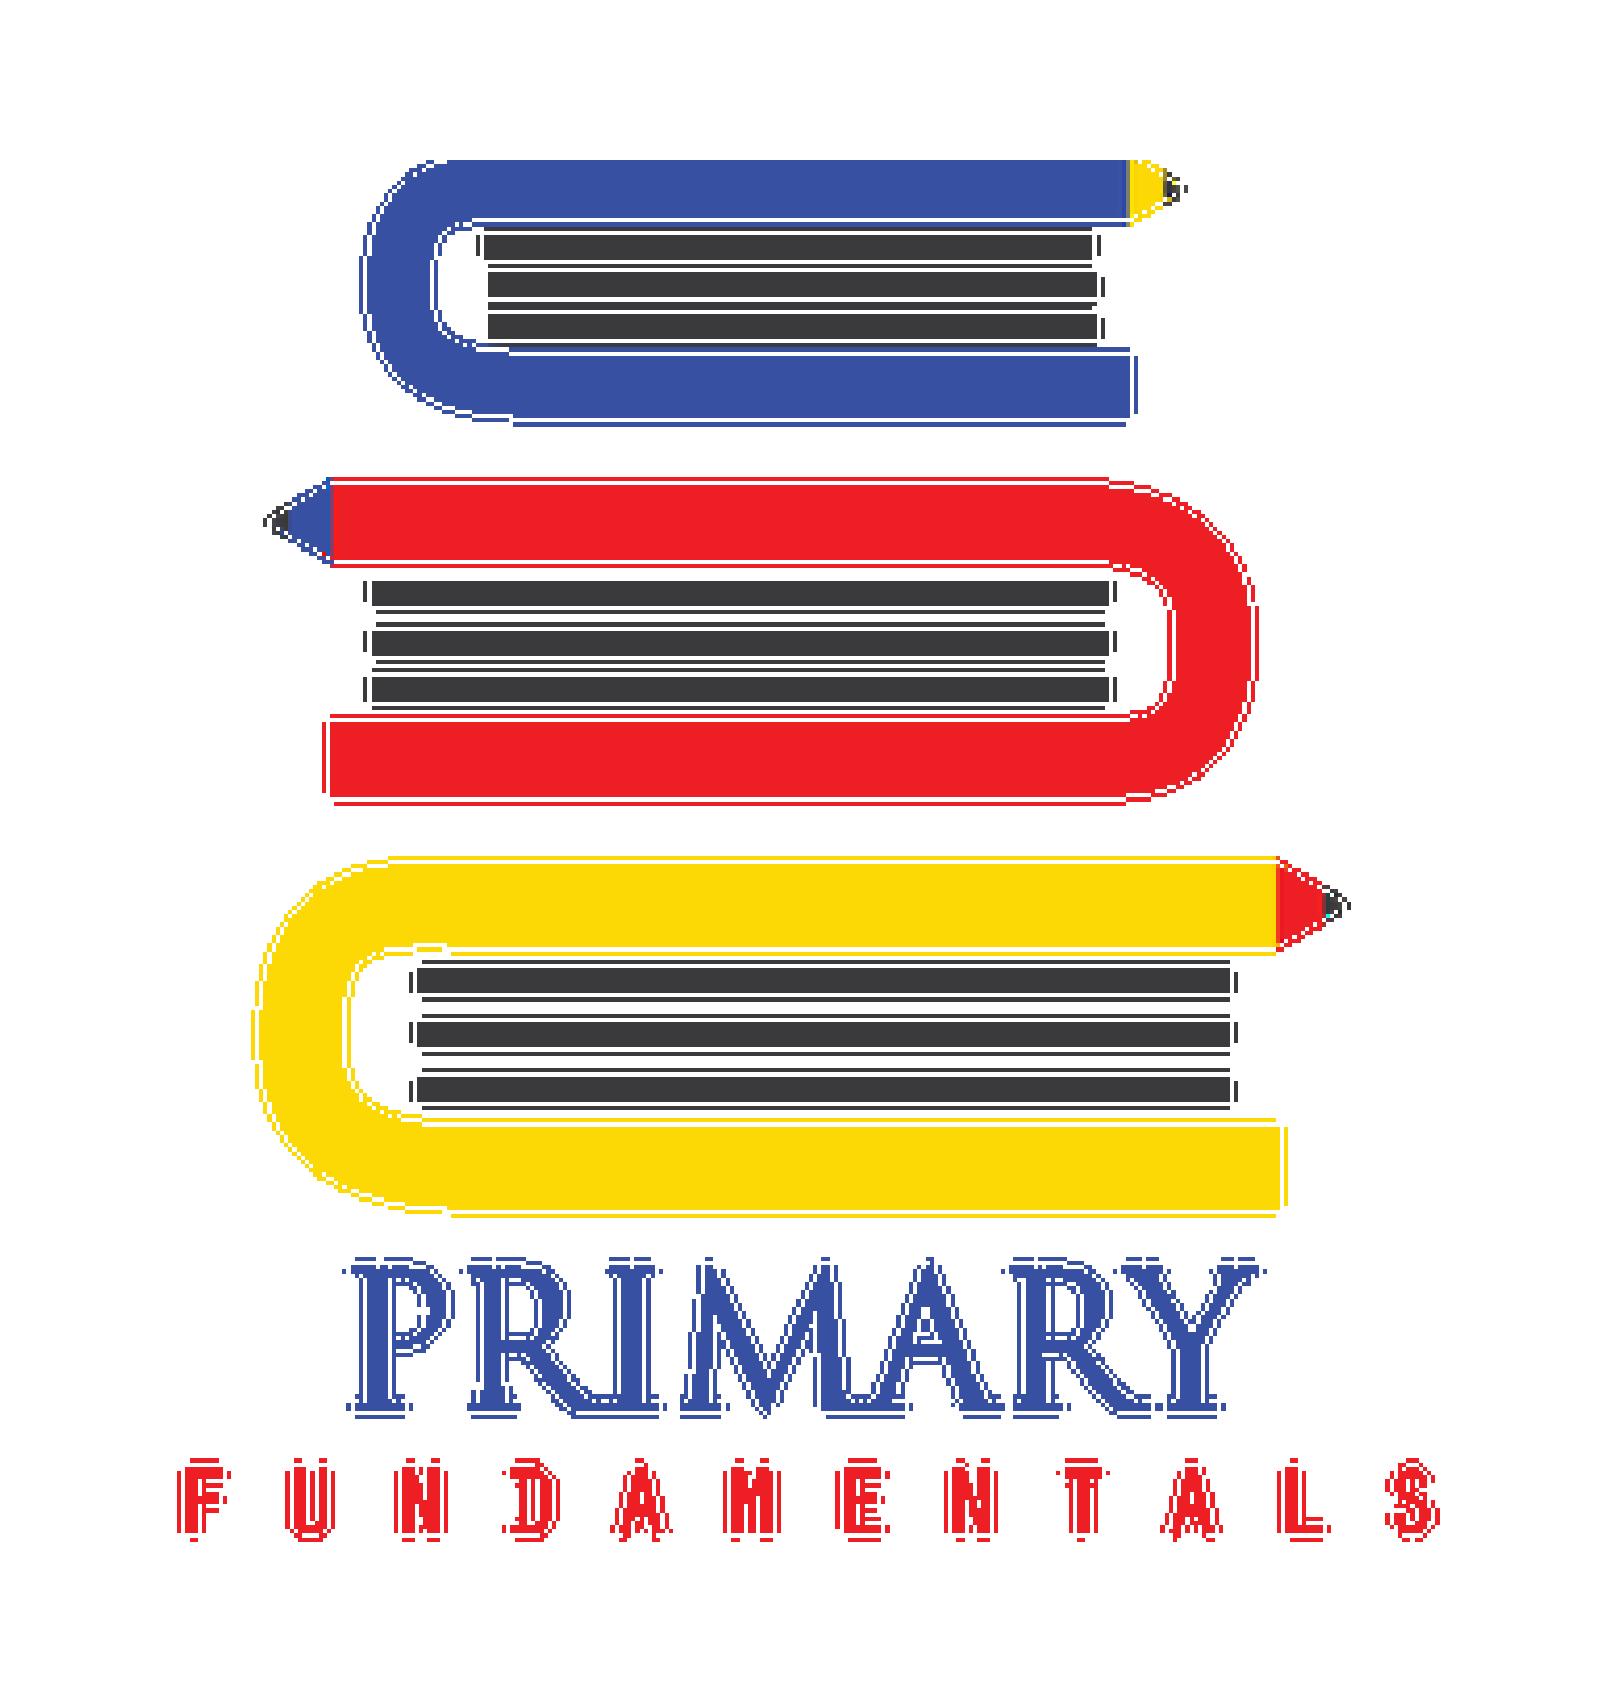 picture of school logo